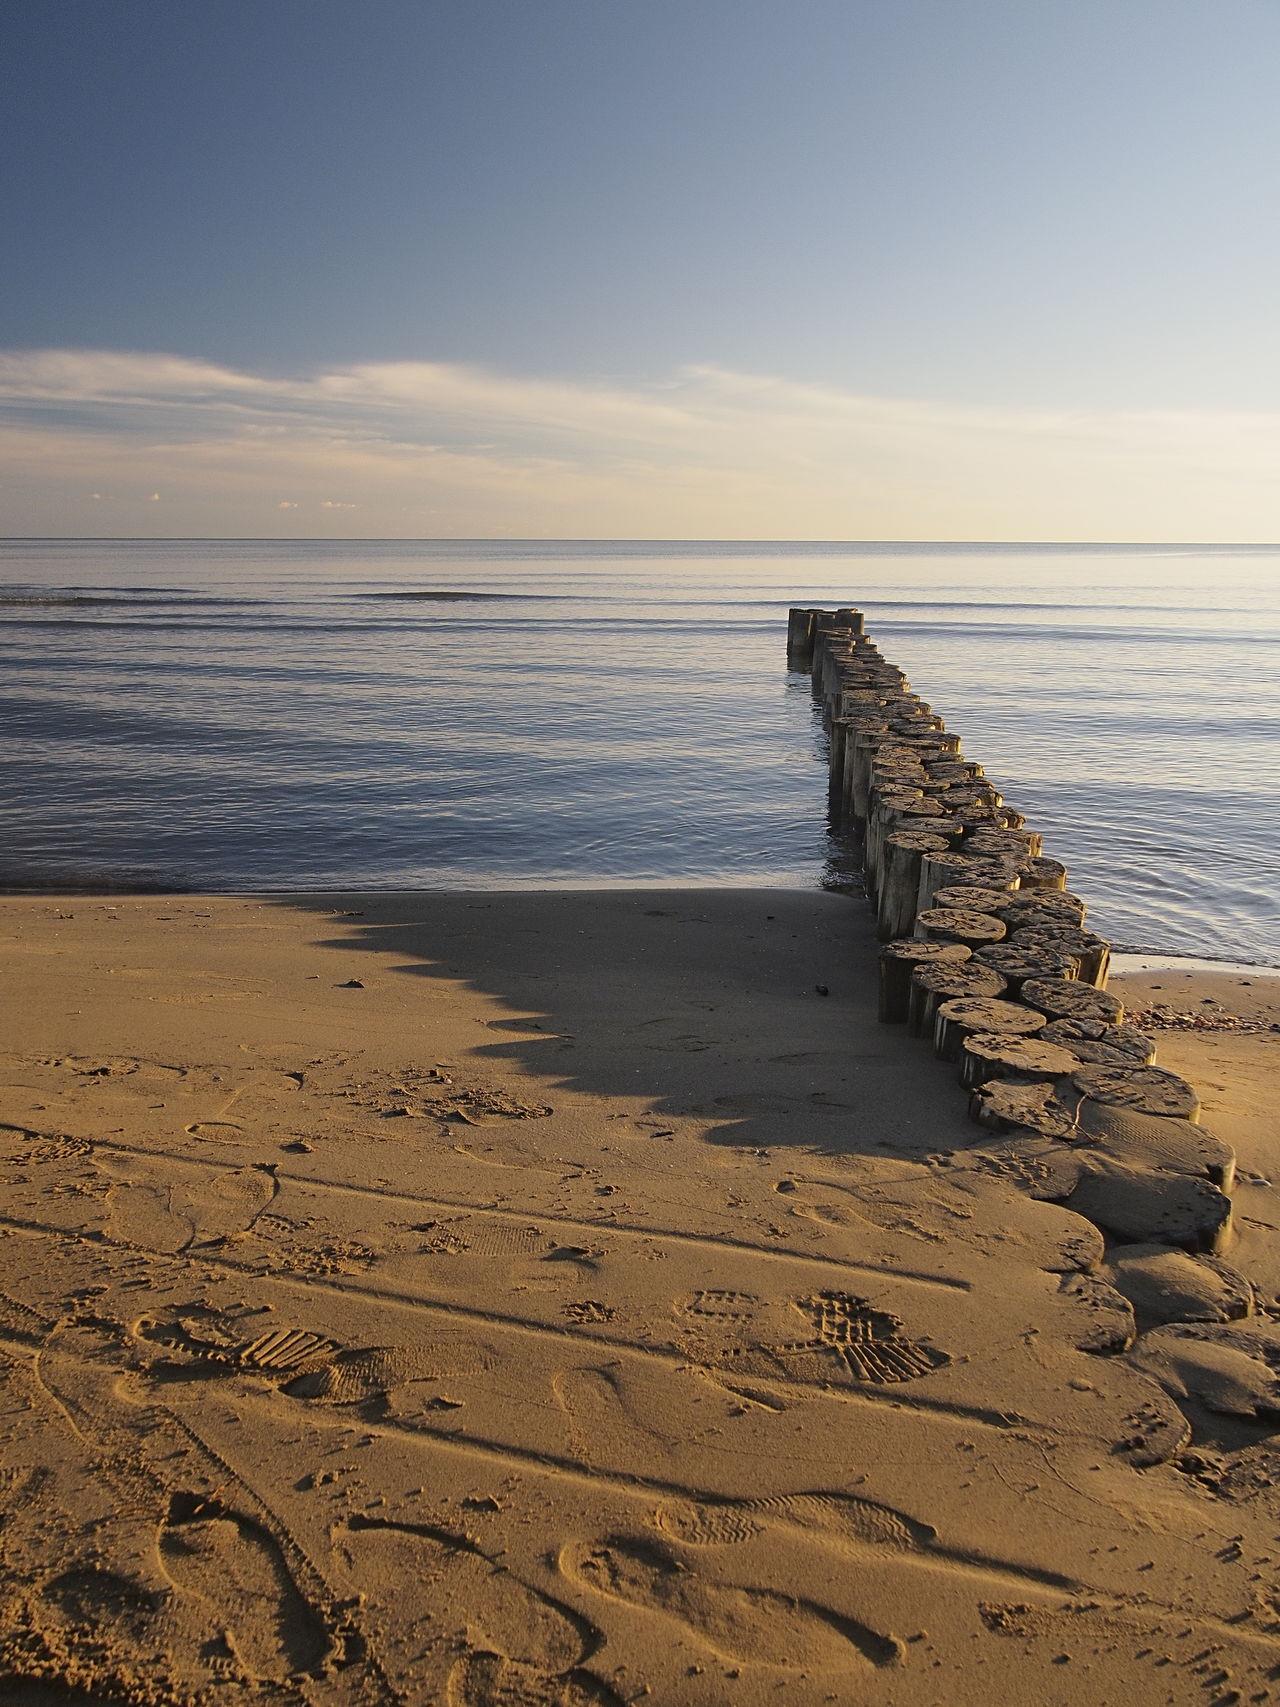 Beach Blue Calm Cloud - Sky Day Eye4photography  EyeEm Best Shots EyeEm Gallery Horizon Over Water Non-urban Scene OlympusPEN Outdoors Sand Sea Shore Sky Tranquil Scene Tranquility Water Zuiko Digital